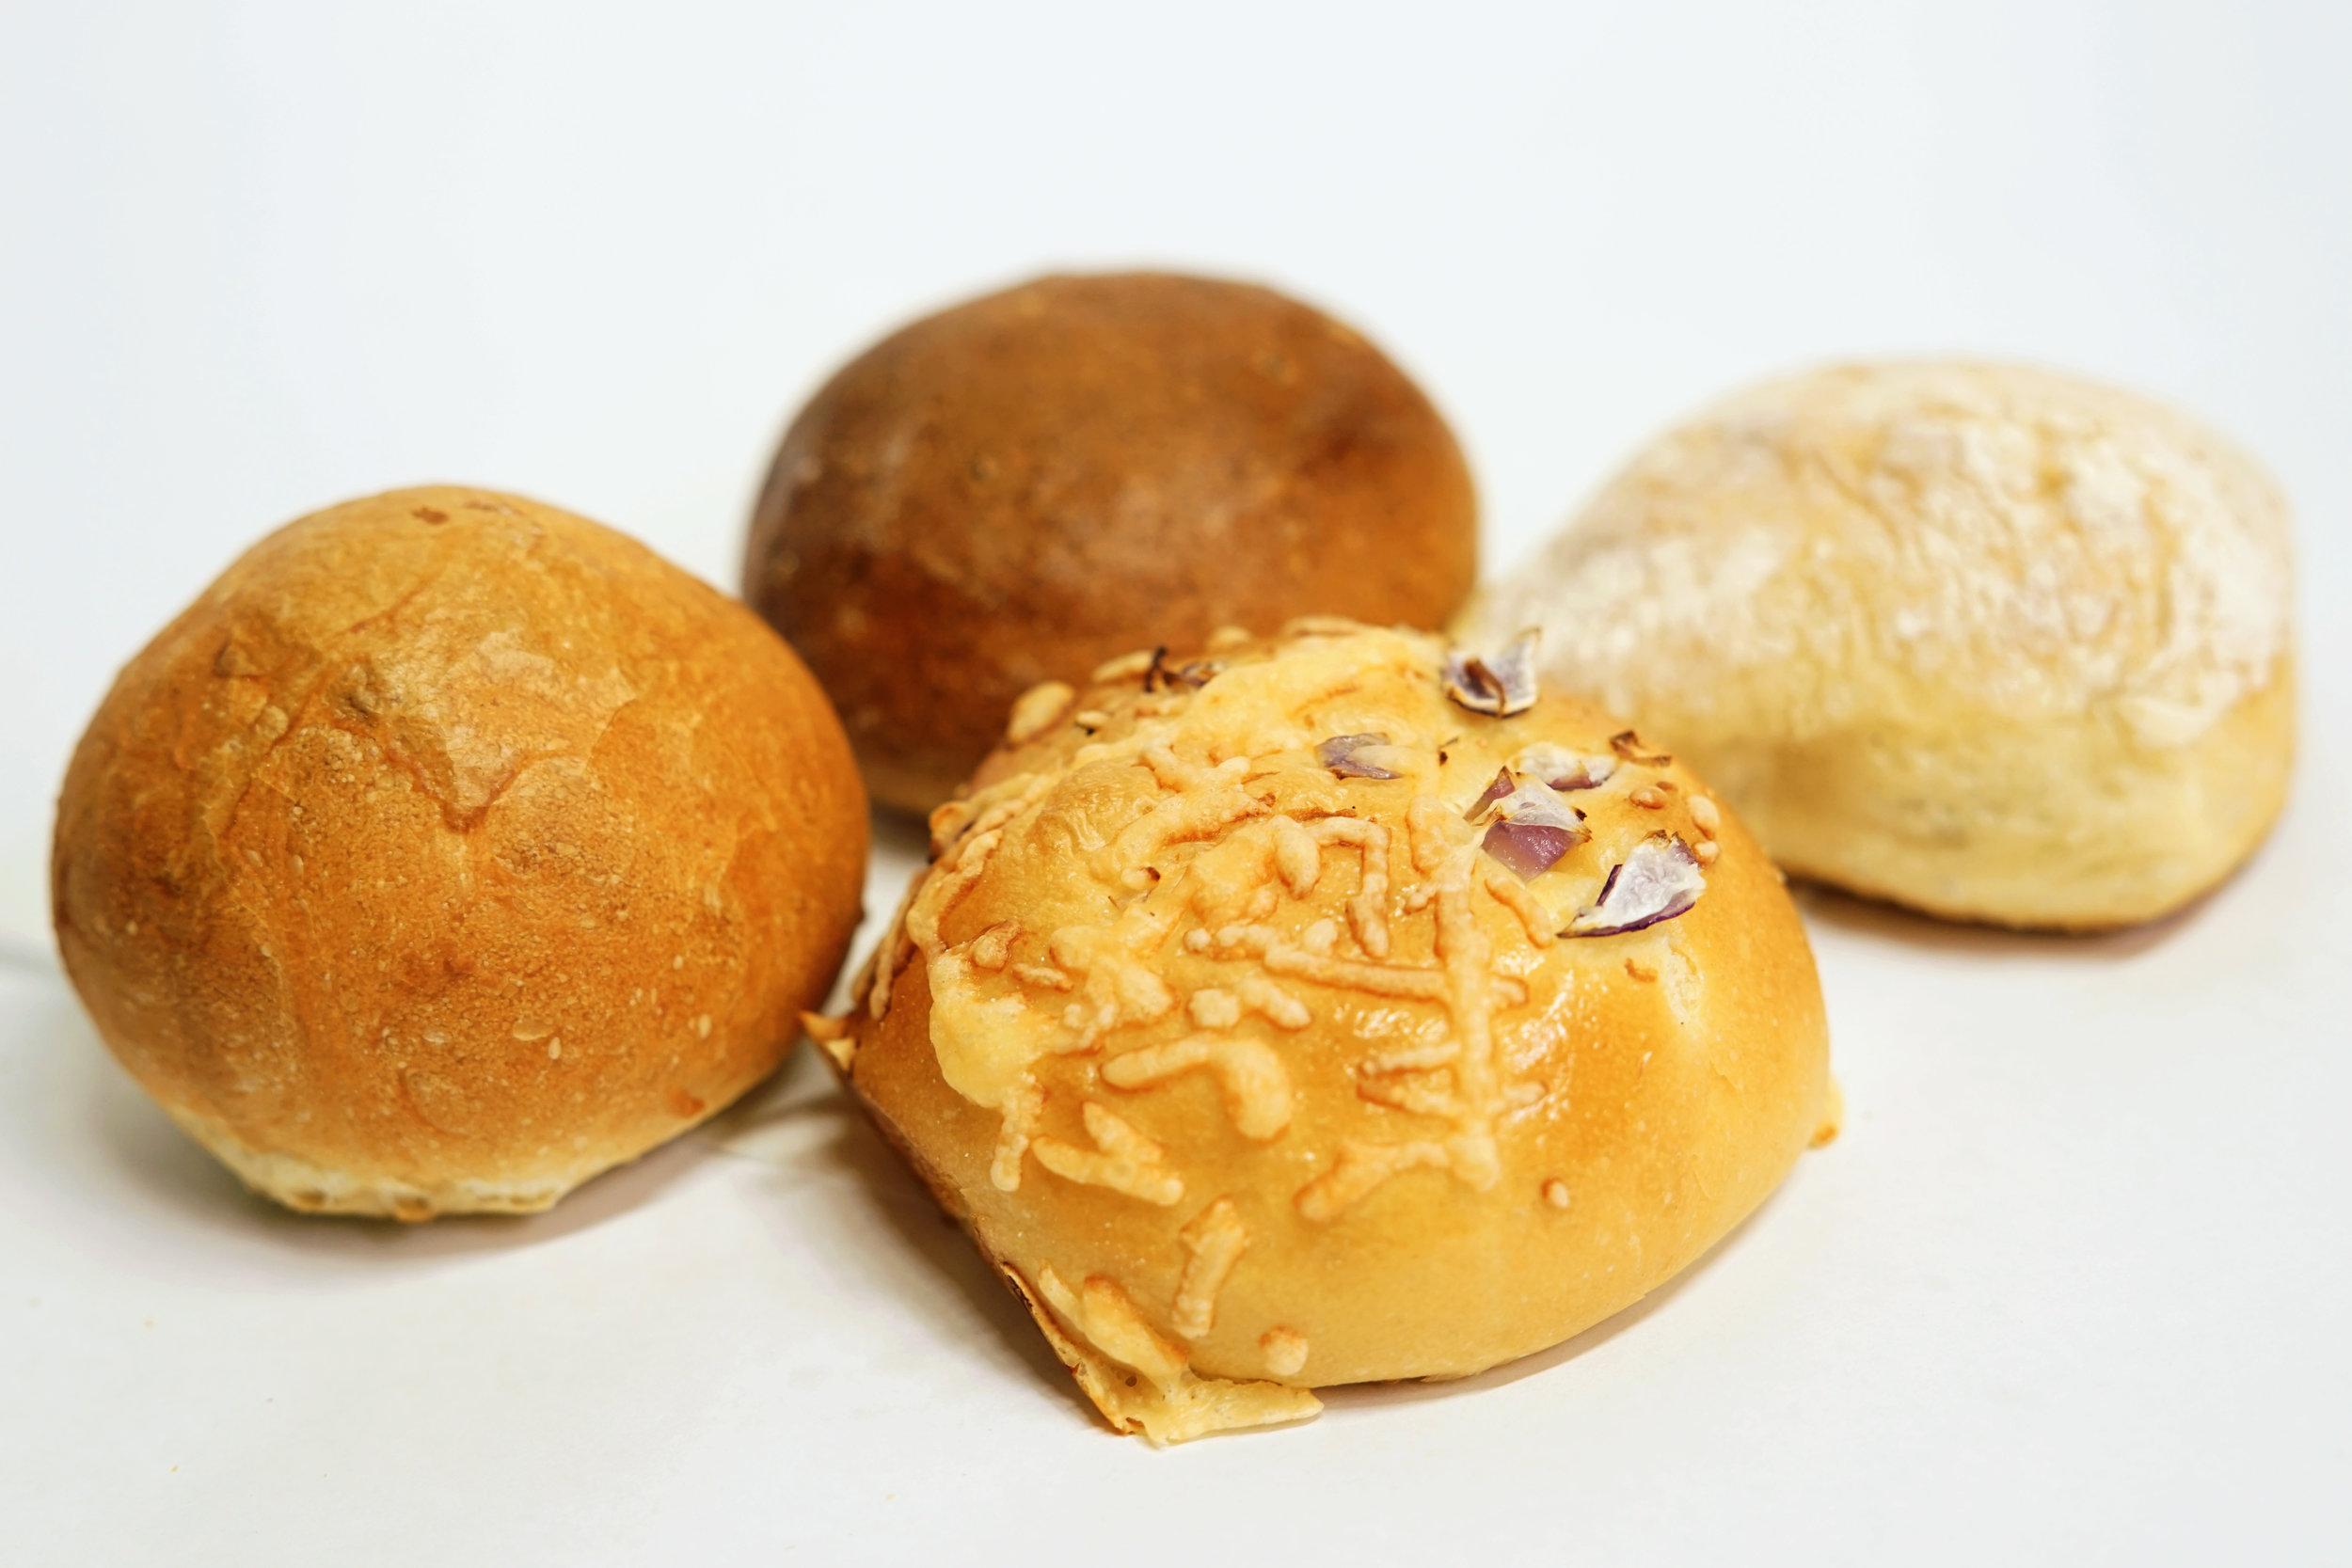 Rolls: - Parker House, Whole Wheat, Provencal, or Petit Pan